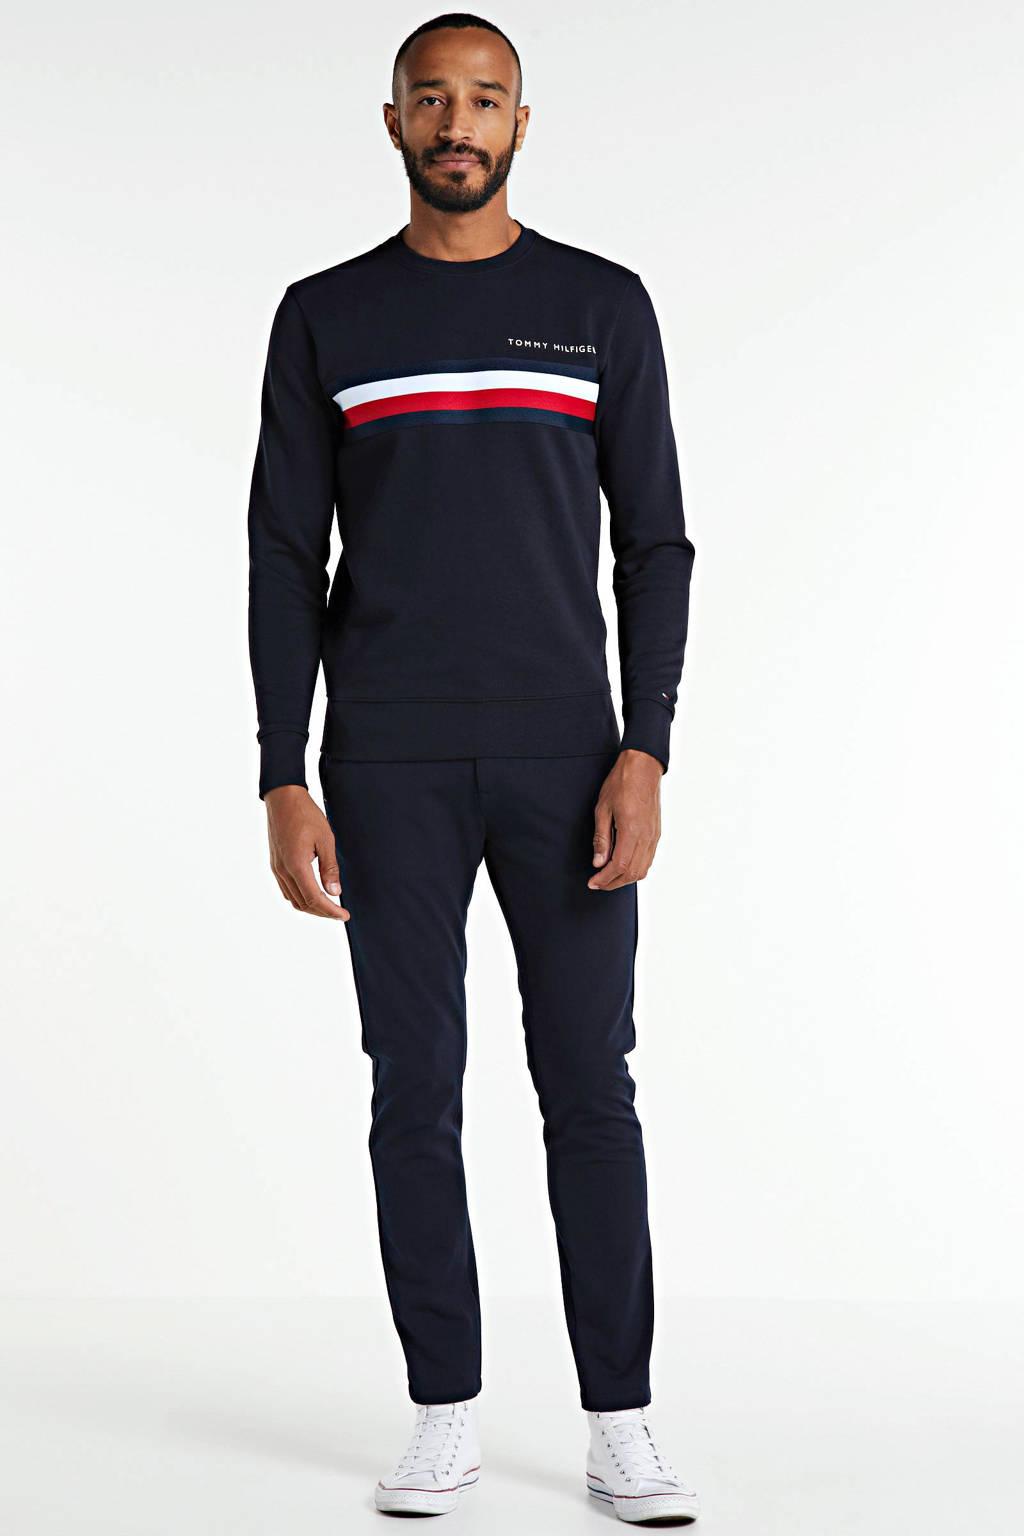 Tommy Hilfiger sweater met logo donkerblauw/wit/rood, Donkerblauw/wit/rood